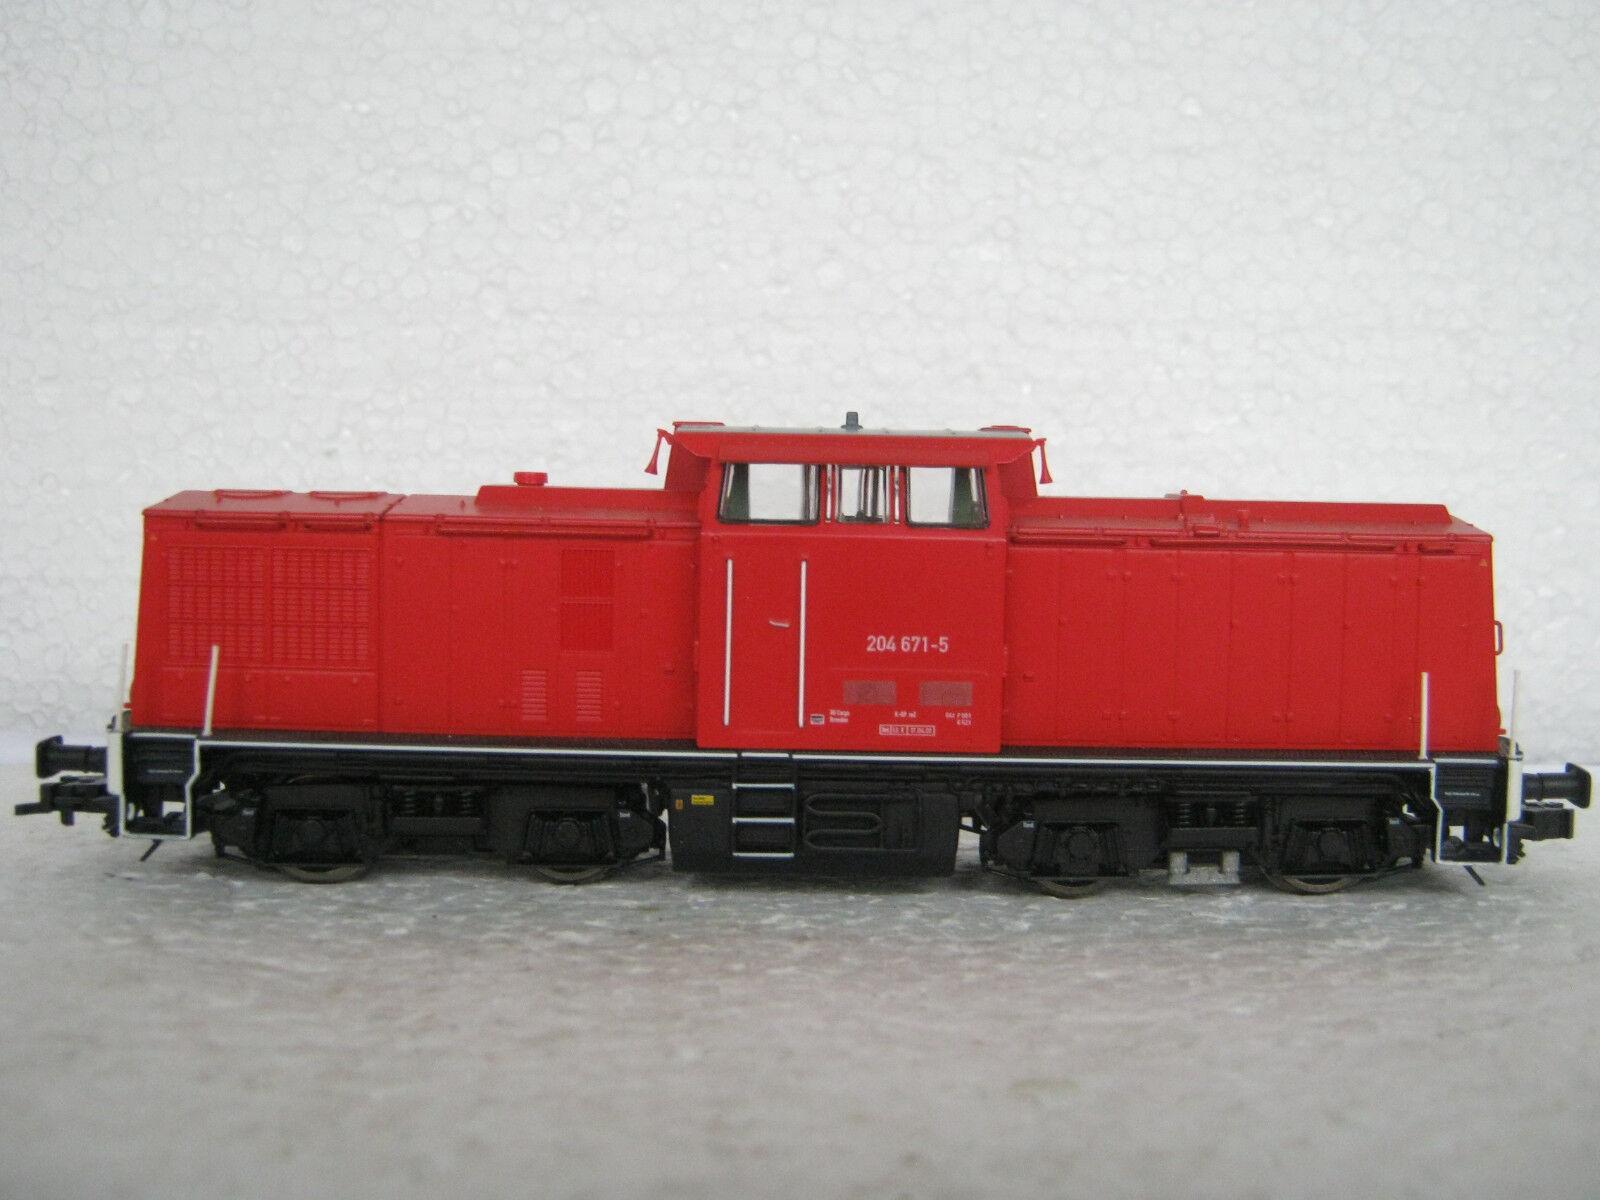 Digital roco ho/DC 62812 DIESEL Lok BR 204 671-5 DB AG  rg/cl/226-85s7/3